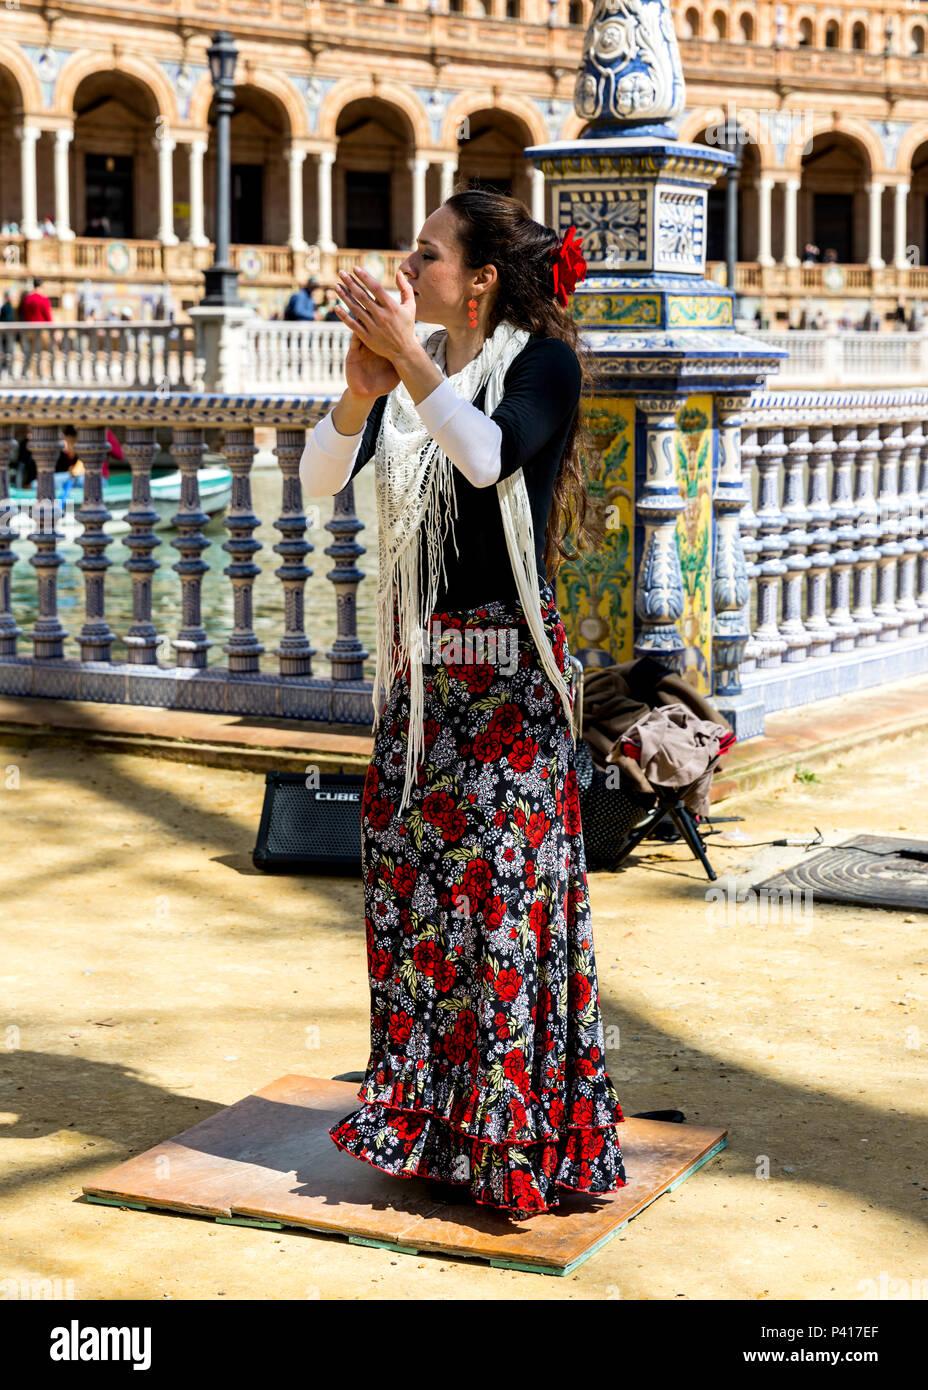 Spanish flamenco dancer, Plaza de Espana, Seville, Andalusia, Spain. - Stock Image